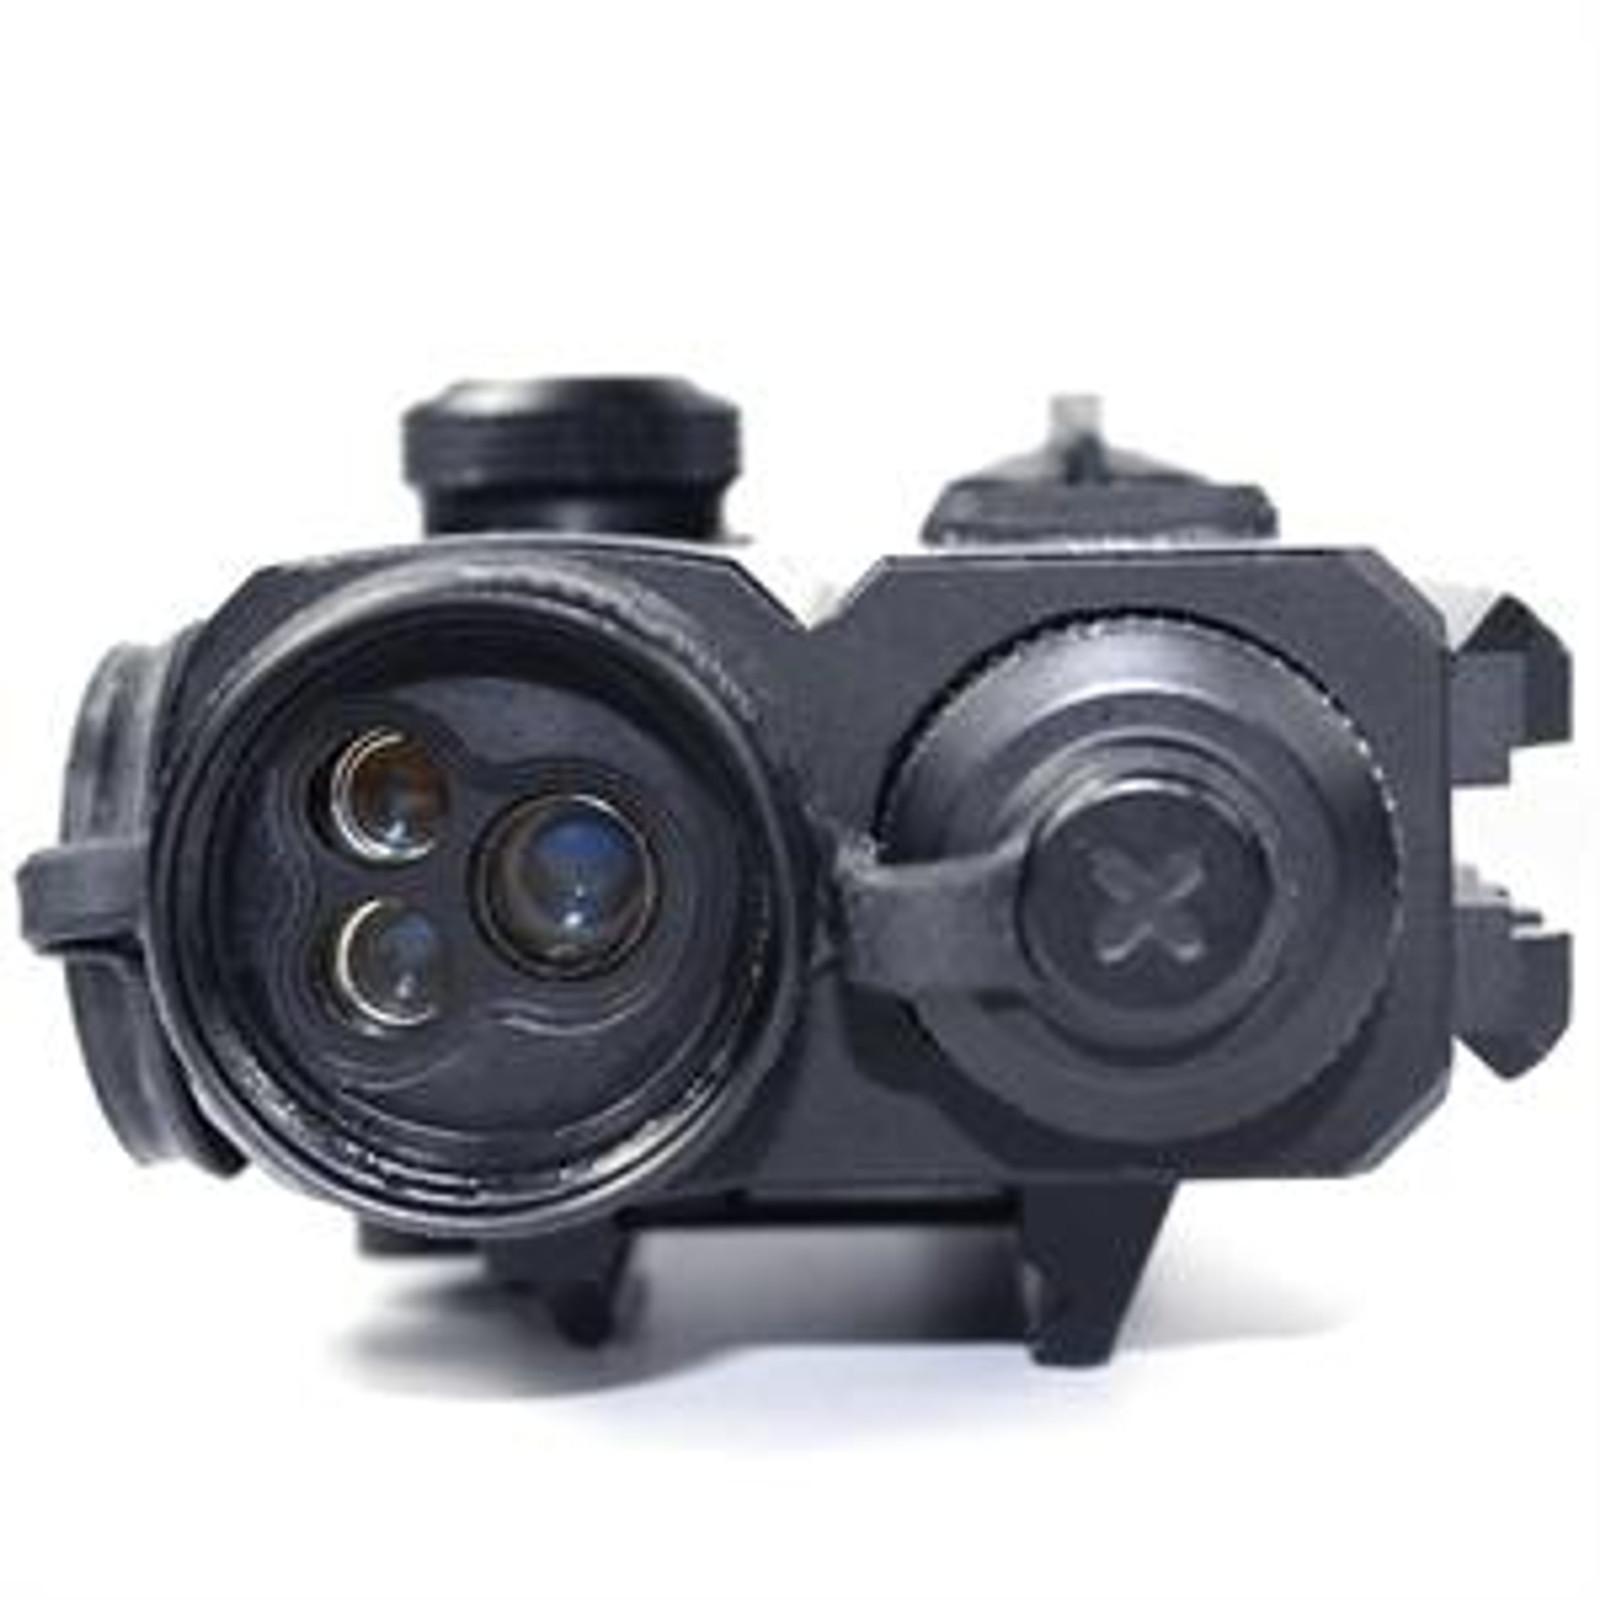 Triad™ Mil/ LE Visible Green Laser /IR Laser/IR Illuminator